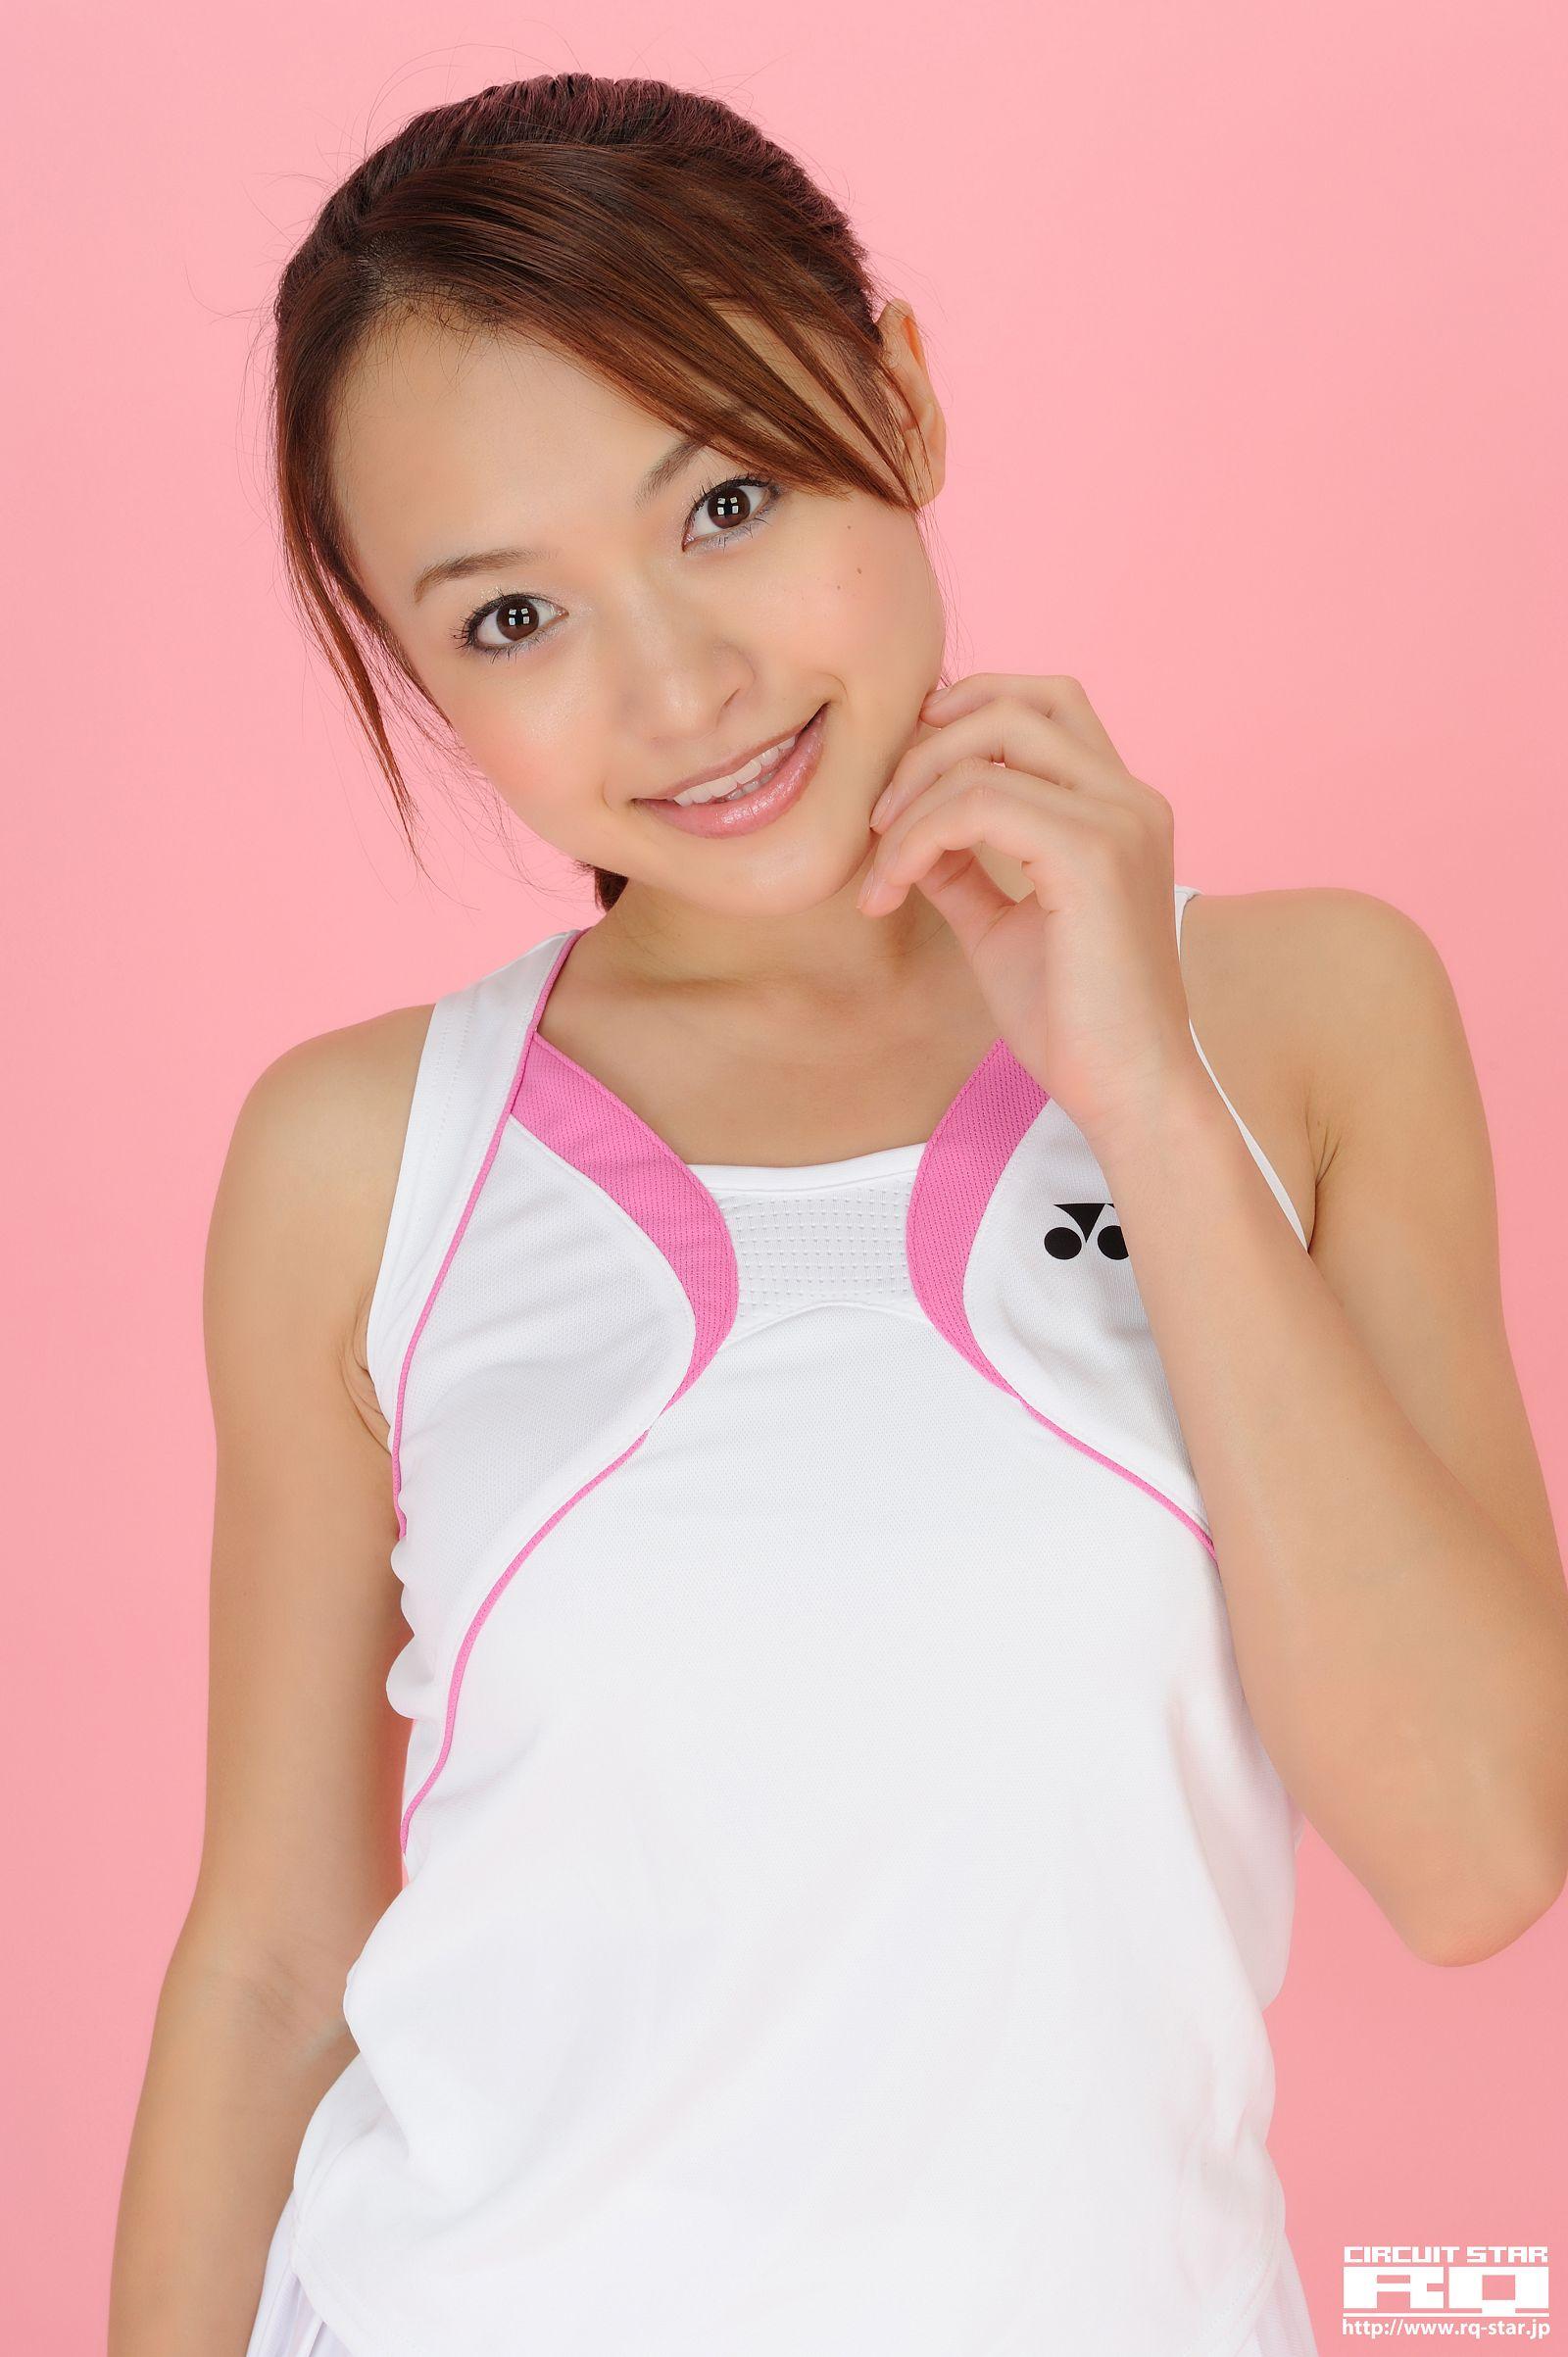 [RQ STAR美女] NO.00434 Rina Itoh 伊東りな Tennis Wear[100P] RQ STAR 第3张